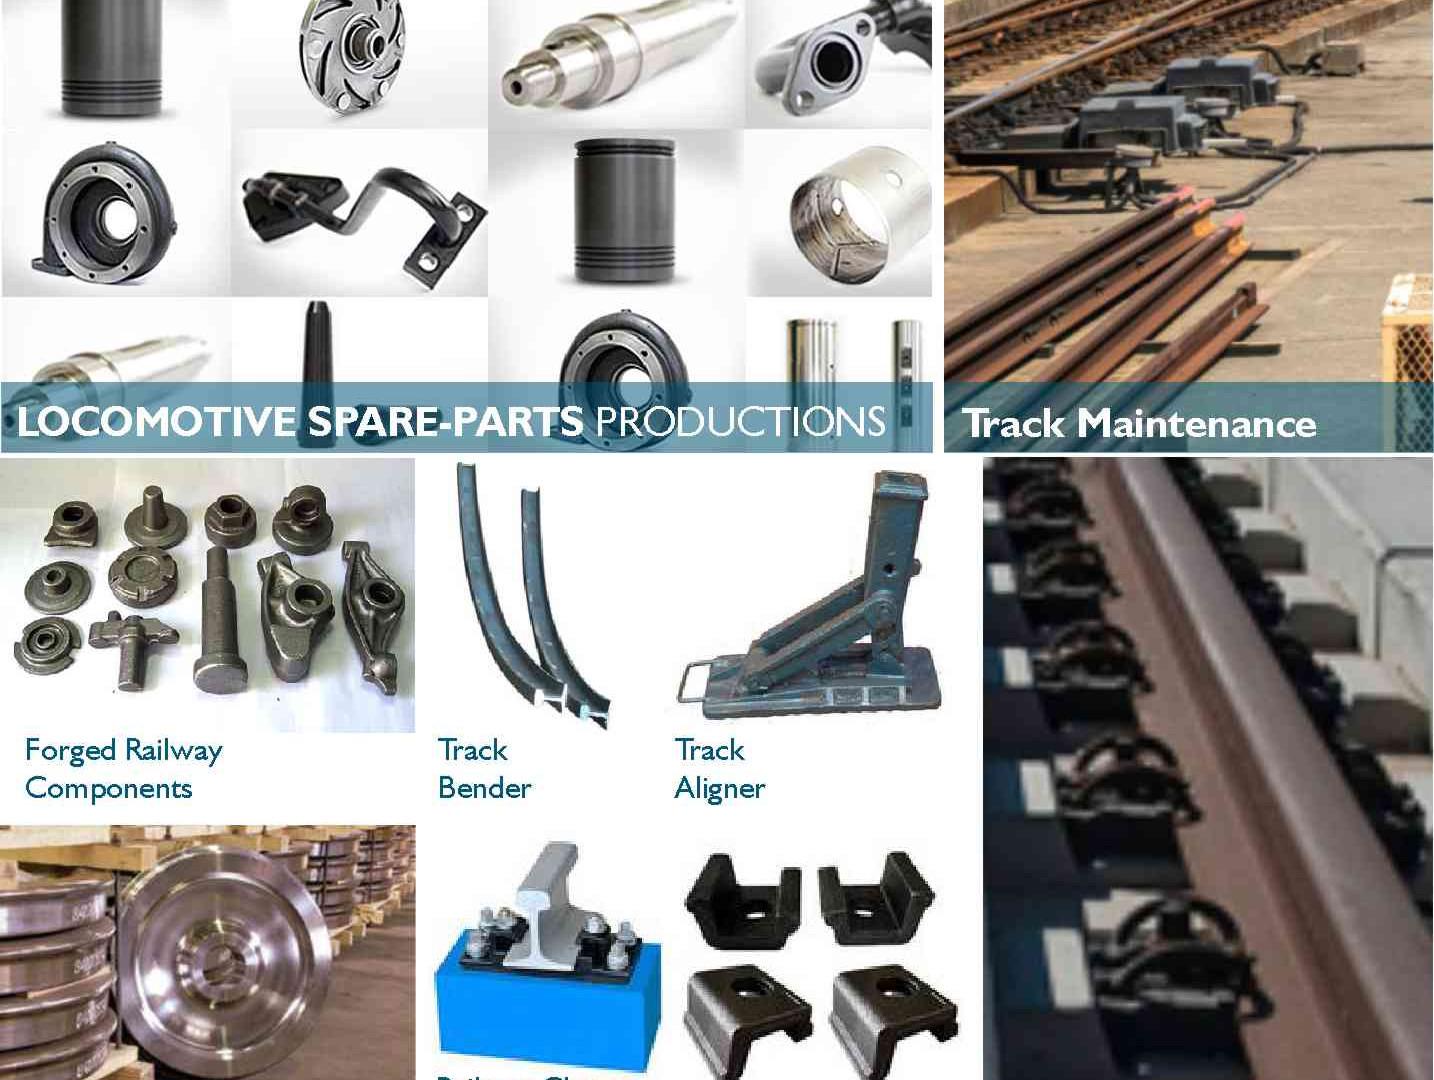 Zeetin Engineering Website Images - Loco